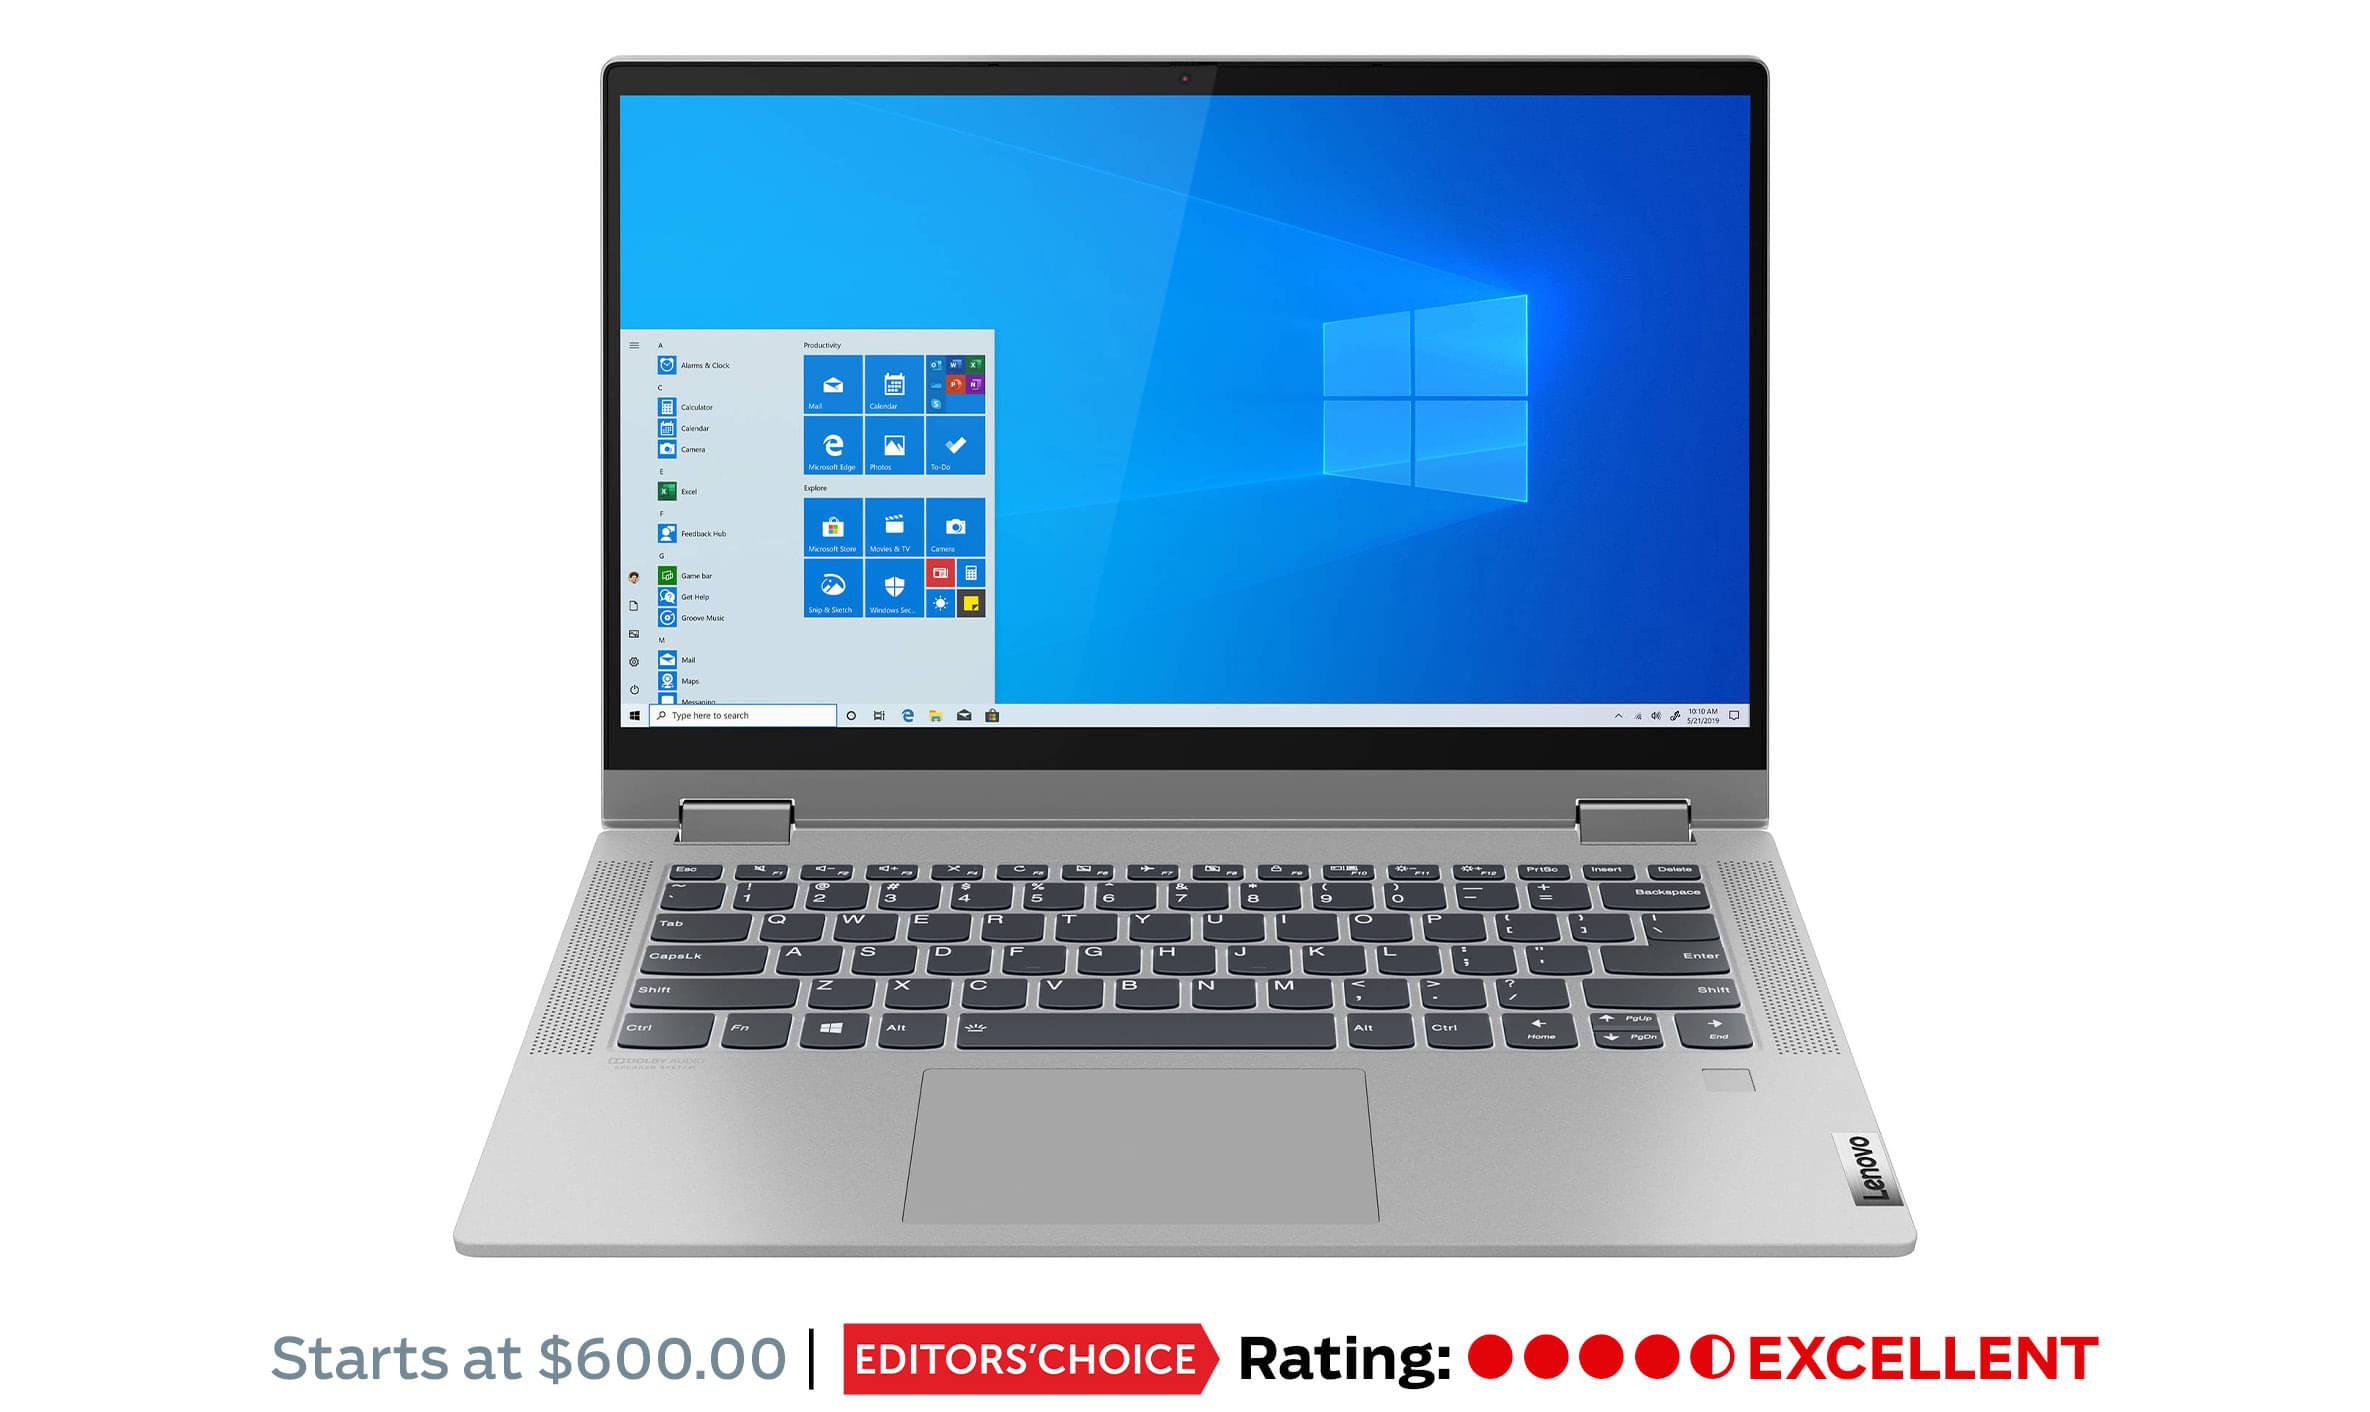 Lenovo IdeaPad Flex 5 14: Excellent Value